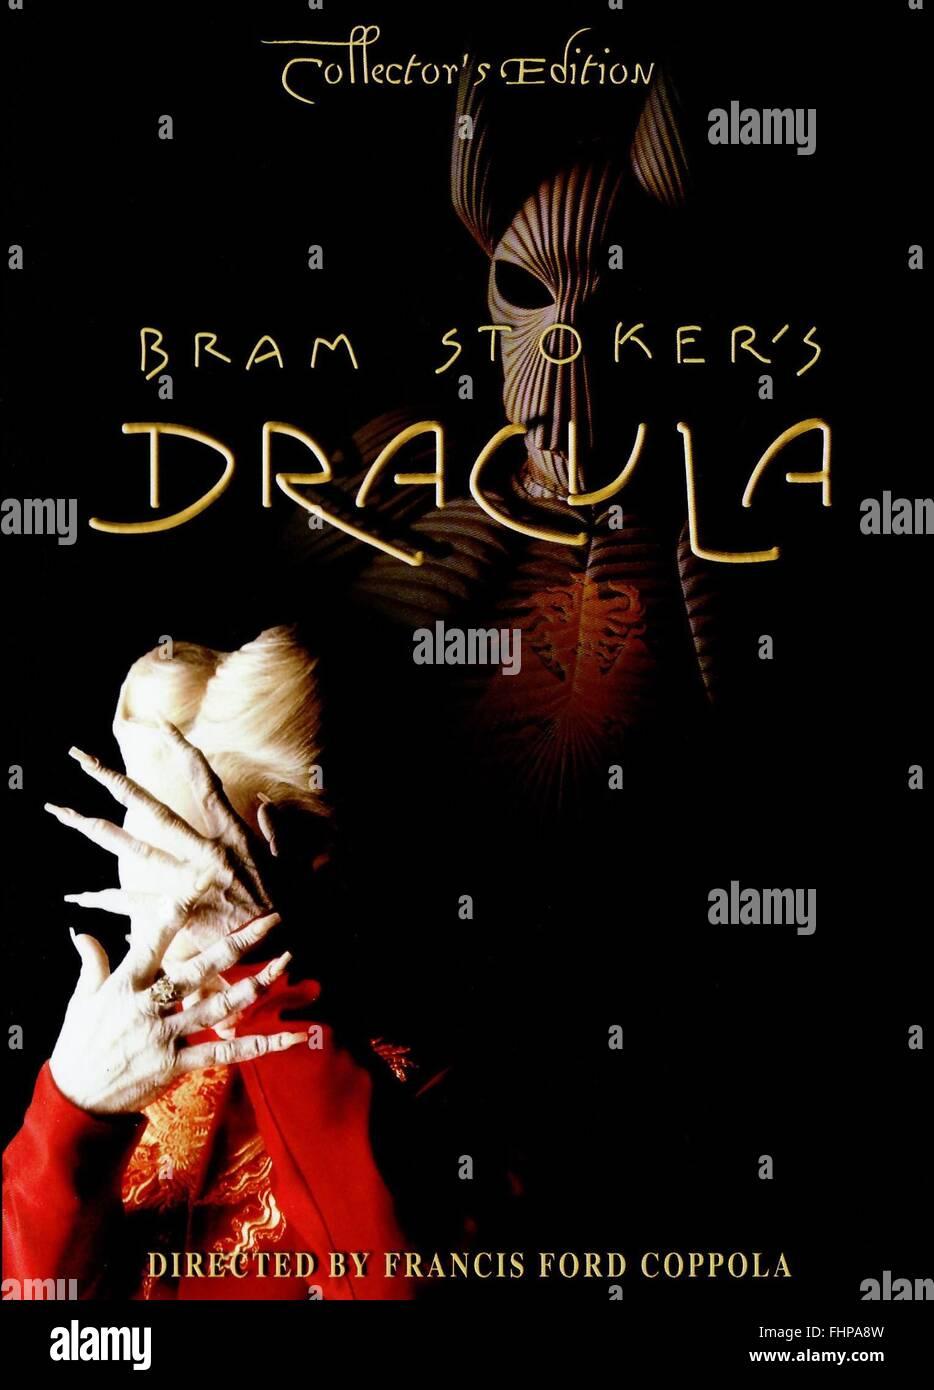 Gary Oldman Poster Dracula Bram Stoker S Dracula 1992 Stock Photo Alamy